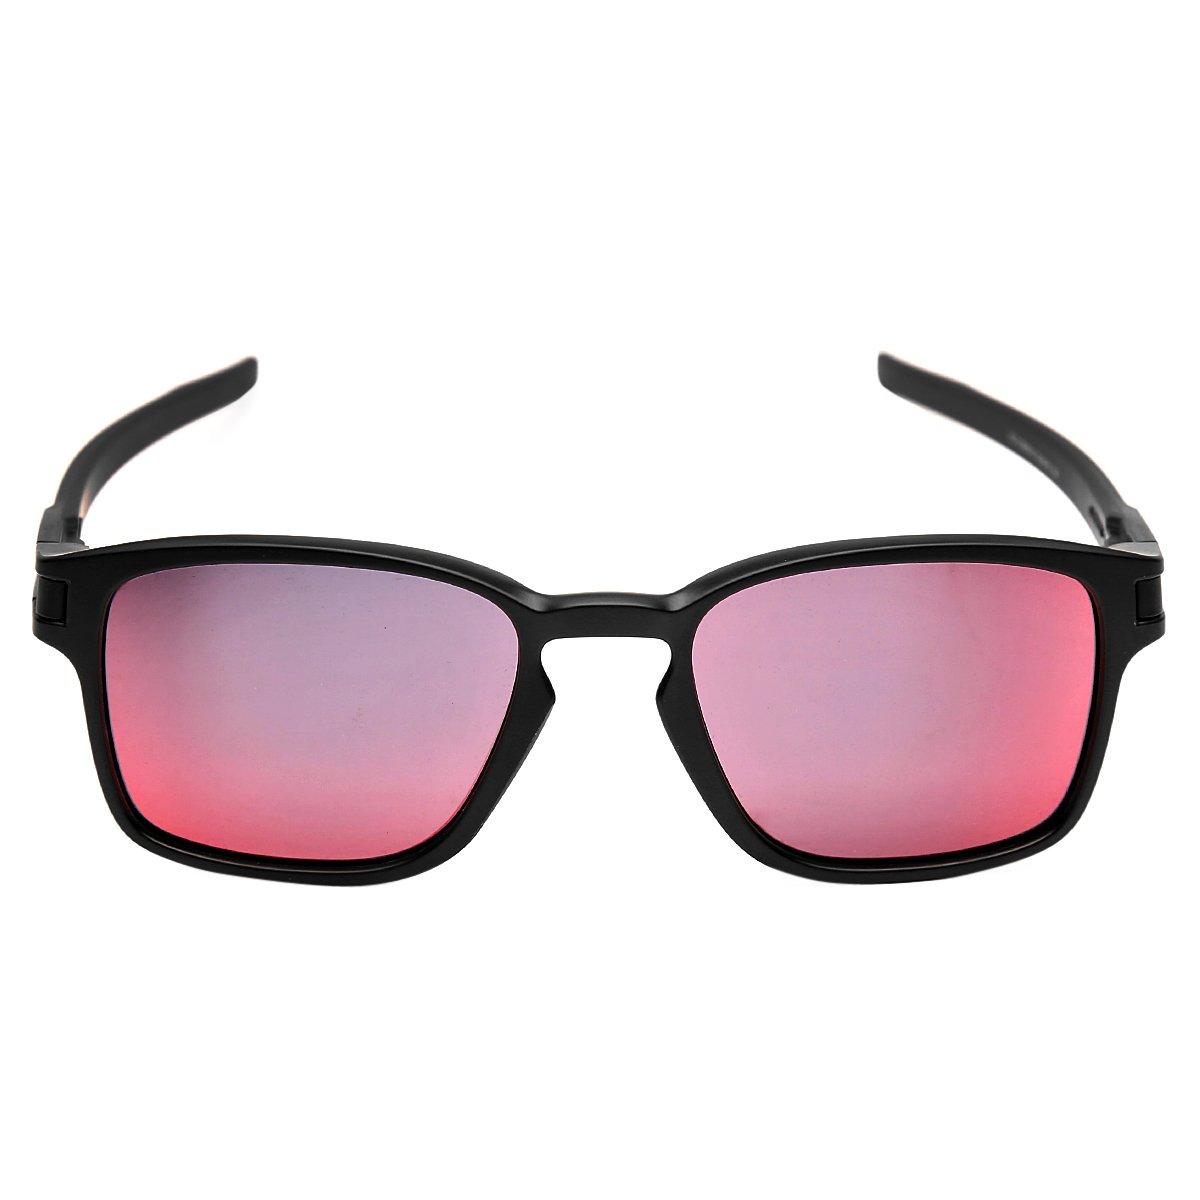 Óculos Oakley Latch Sq-Iridium - Compre Agora   Netshoes 8a2205d04a